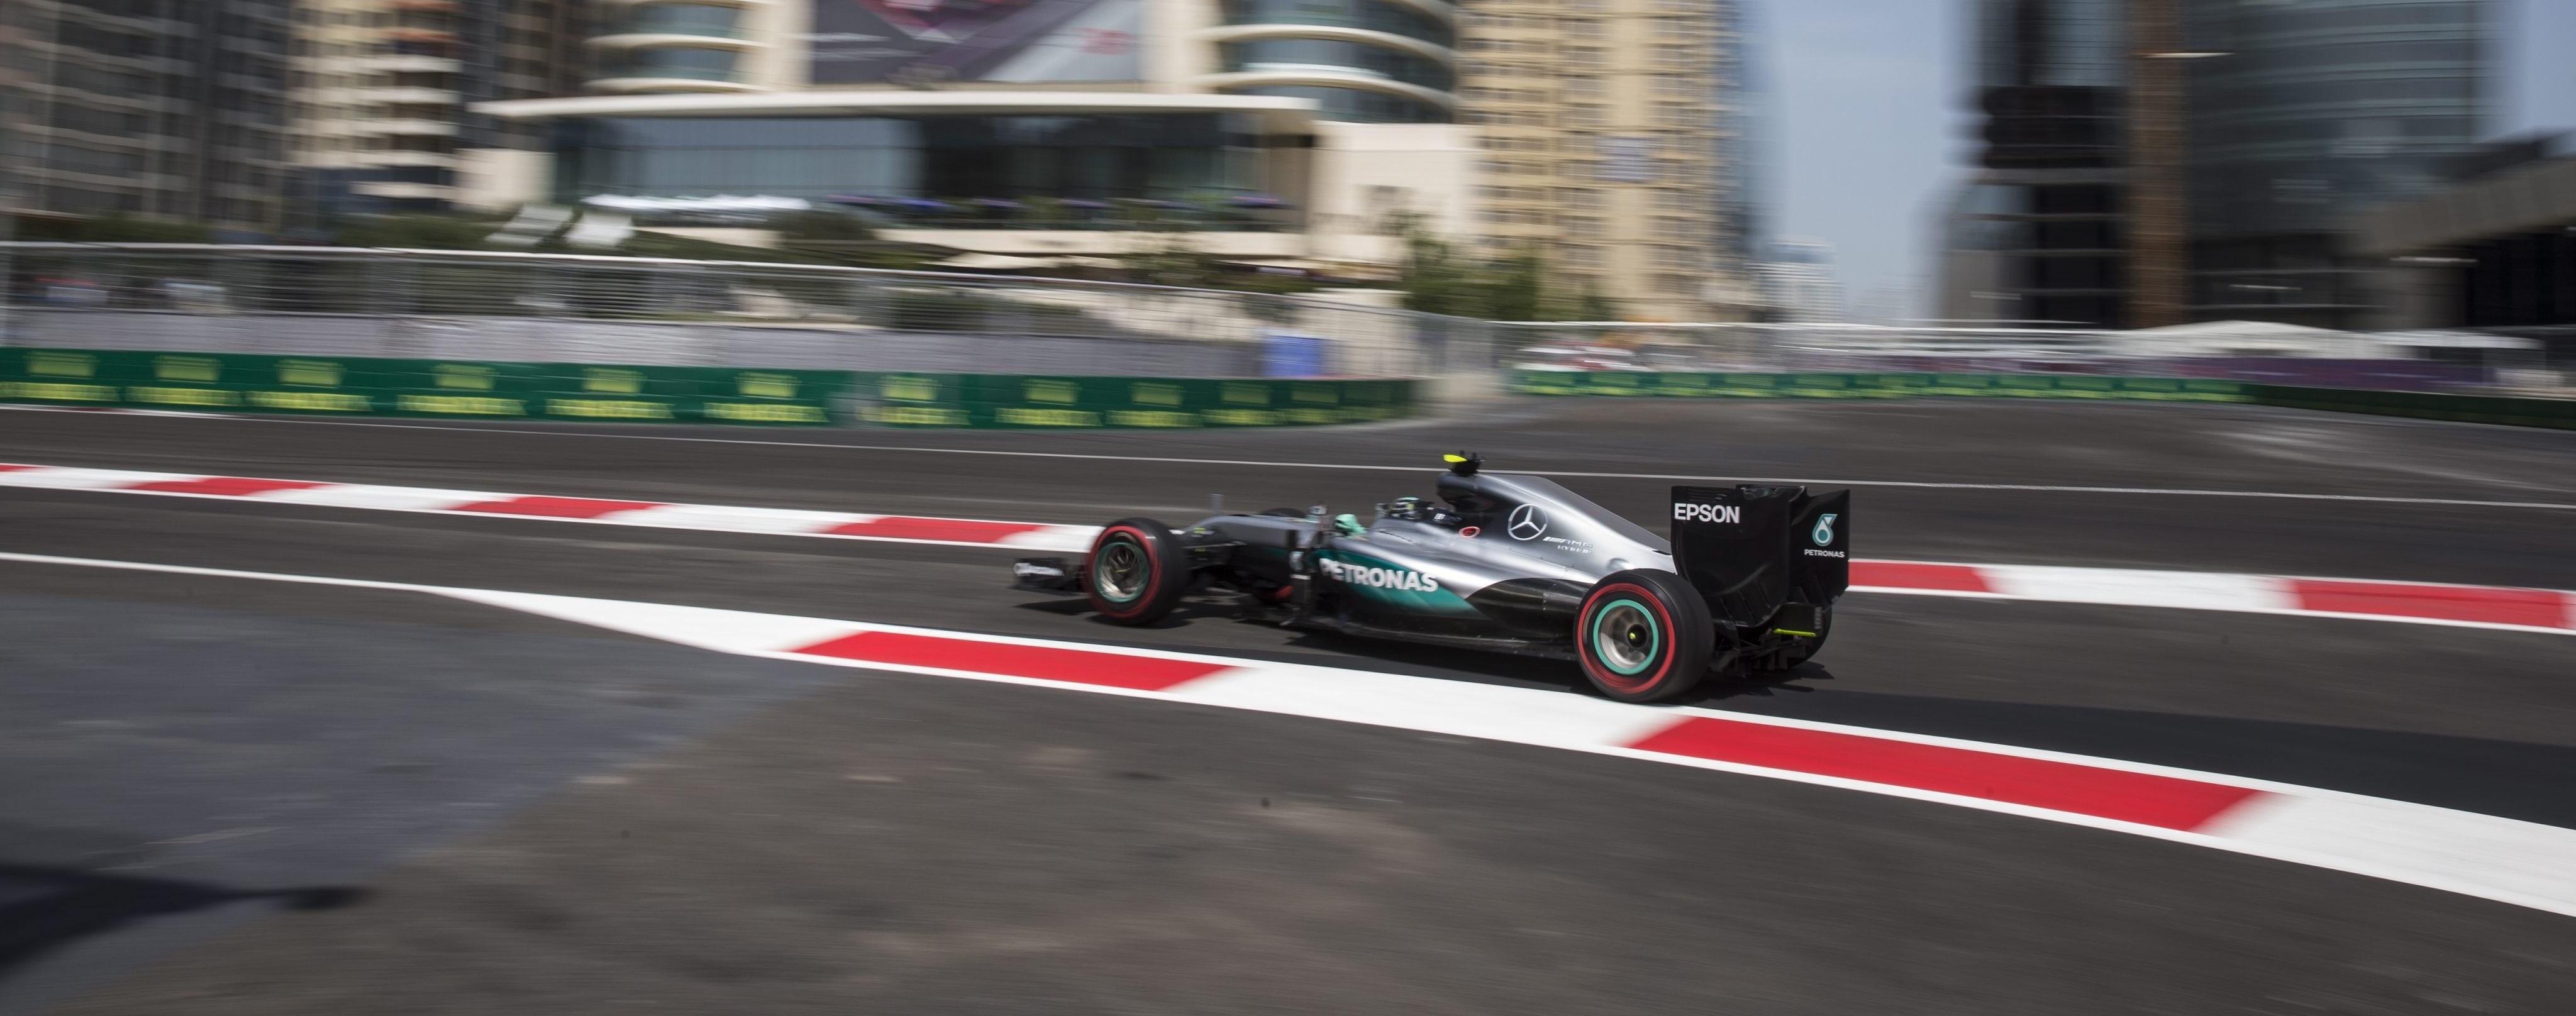 Nico Rosberg F1 Bakú 2016